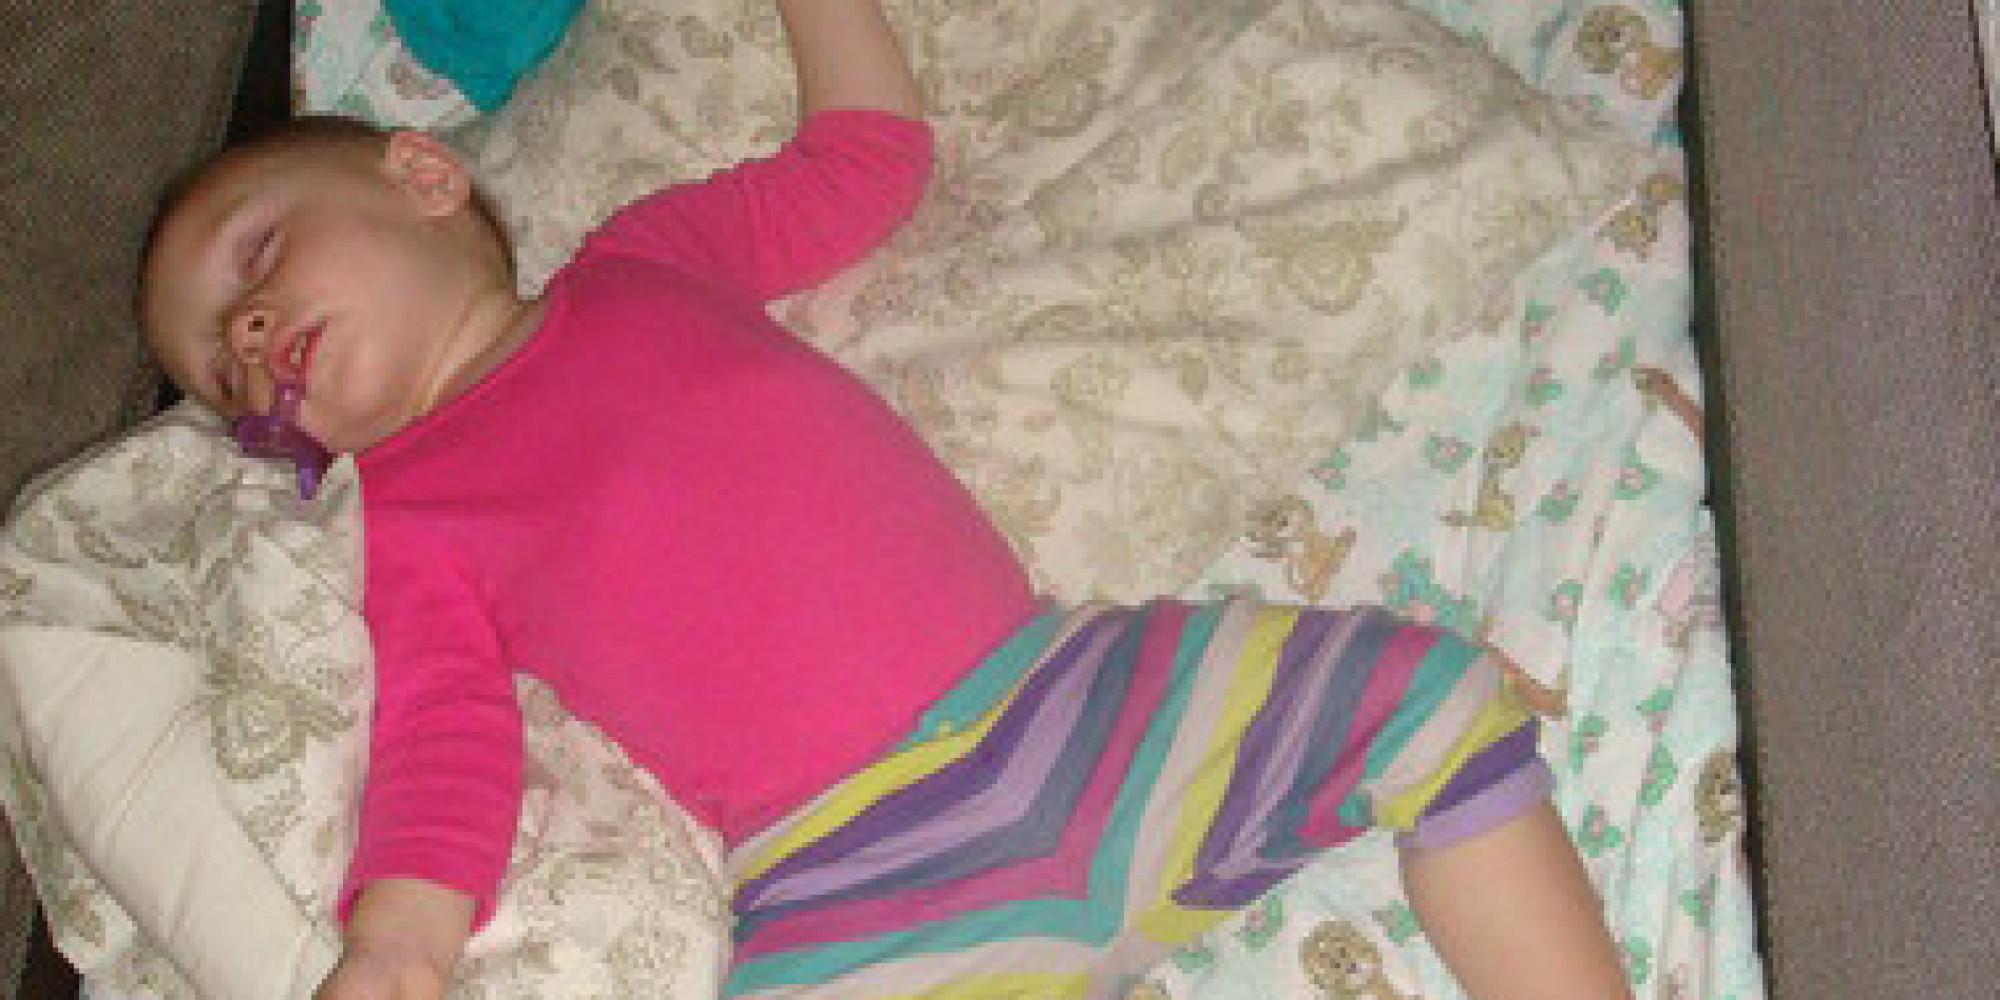 Newborn Fell Off Hospital Bed